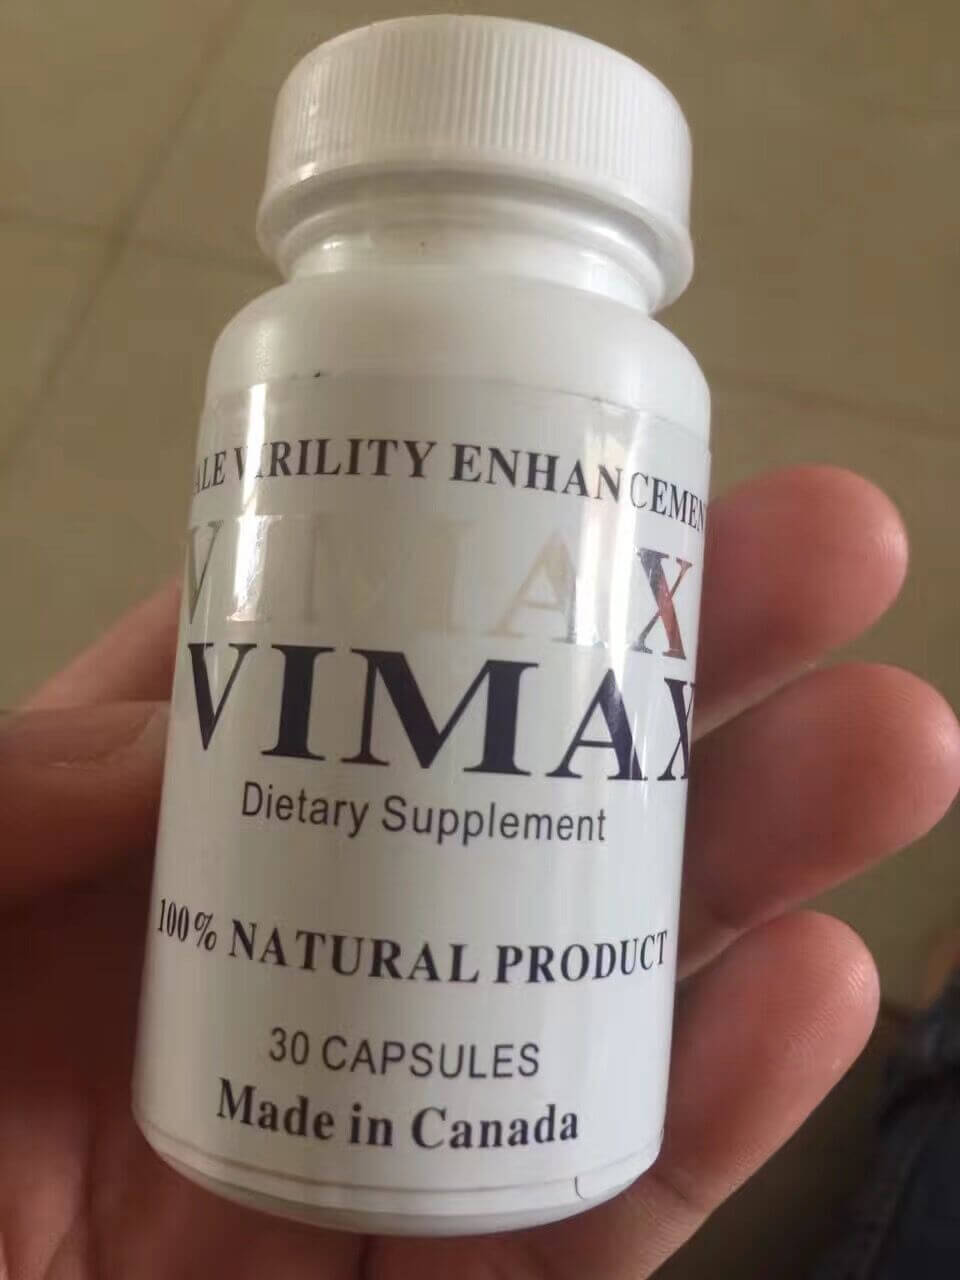 Vimax official website